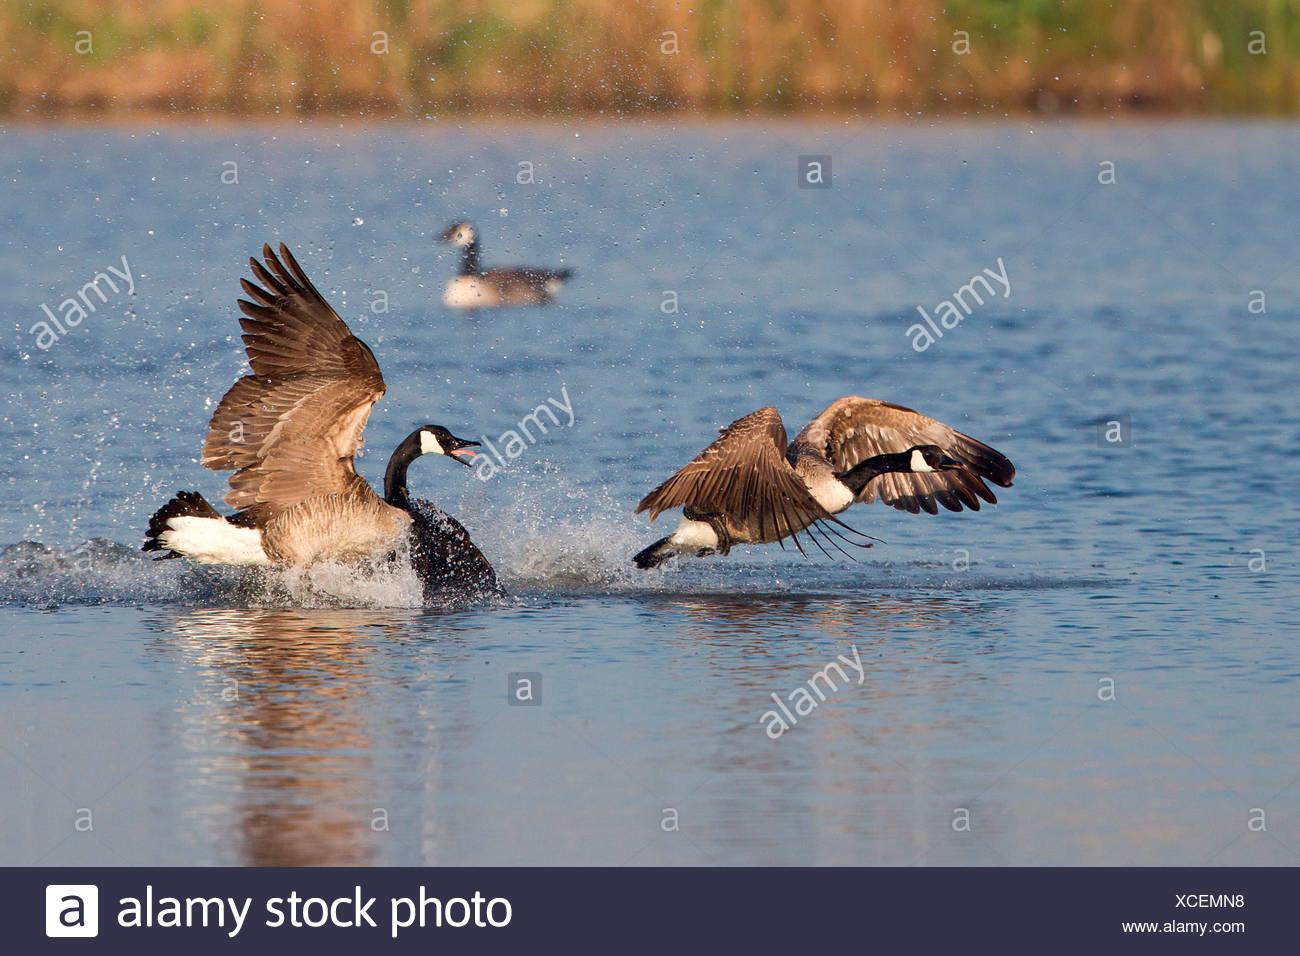 Canada Goose (Branta canadensis) chasing rival - Stock Image